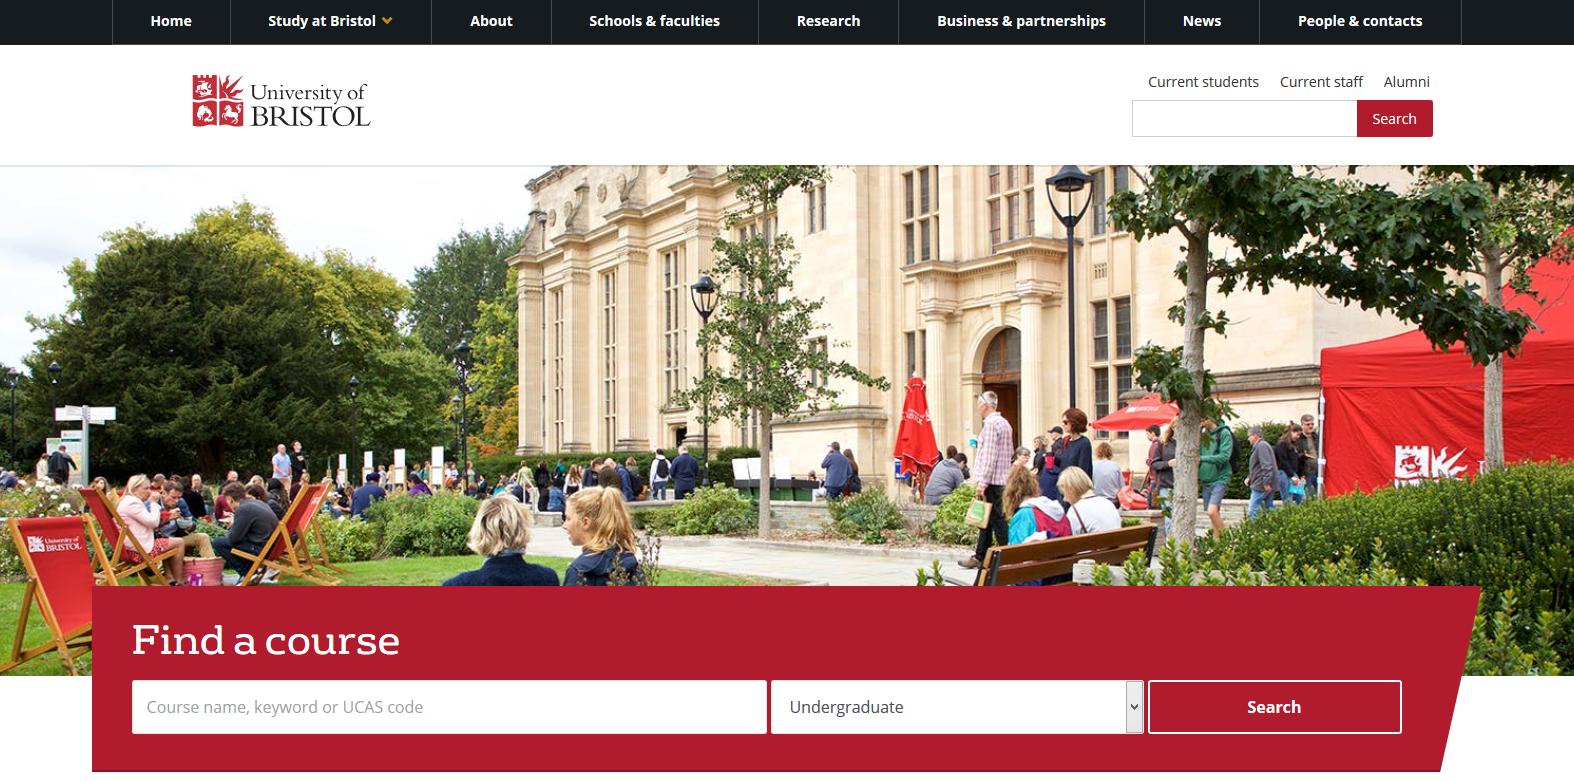 Bristol University UK SWOT and PEST Analysis